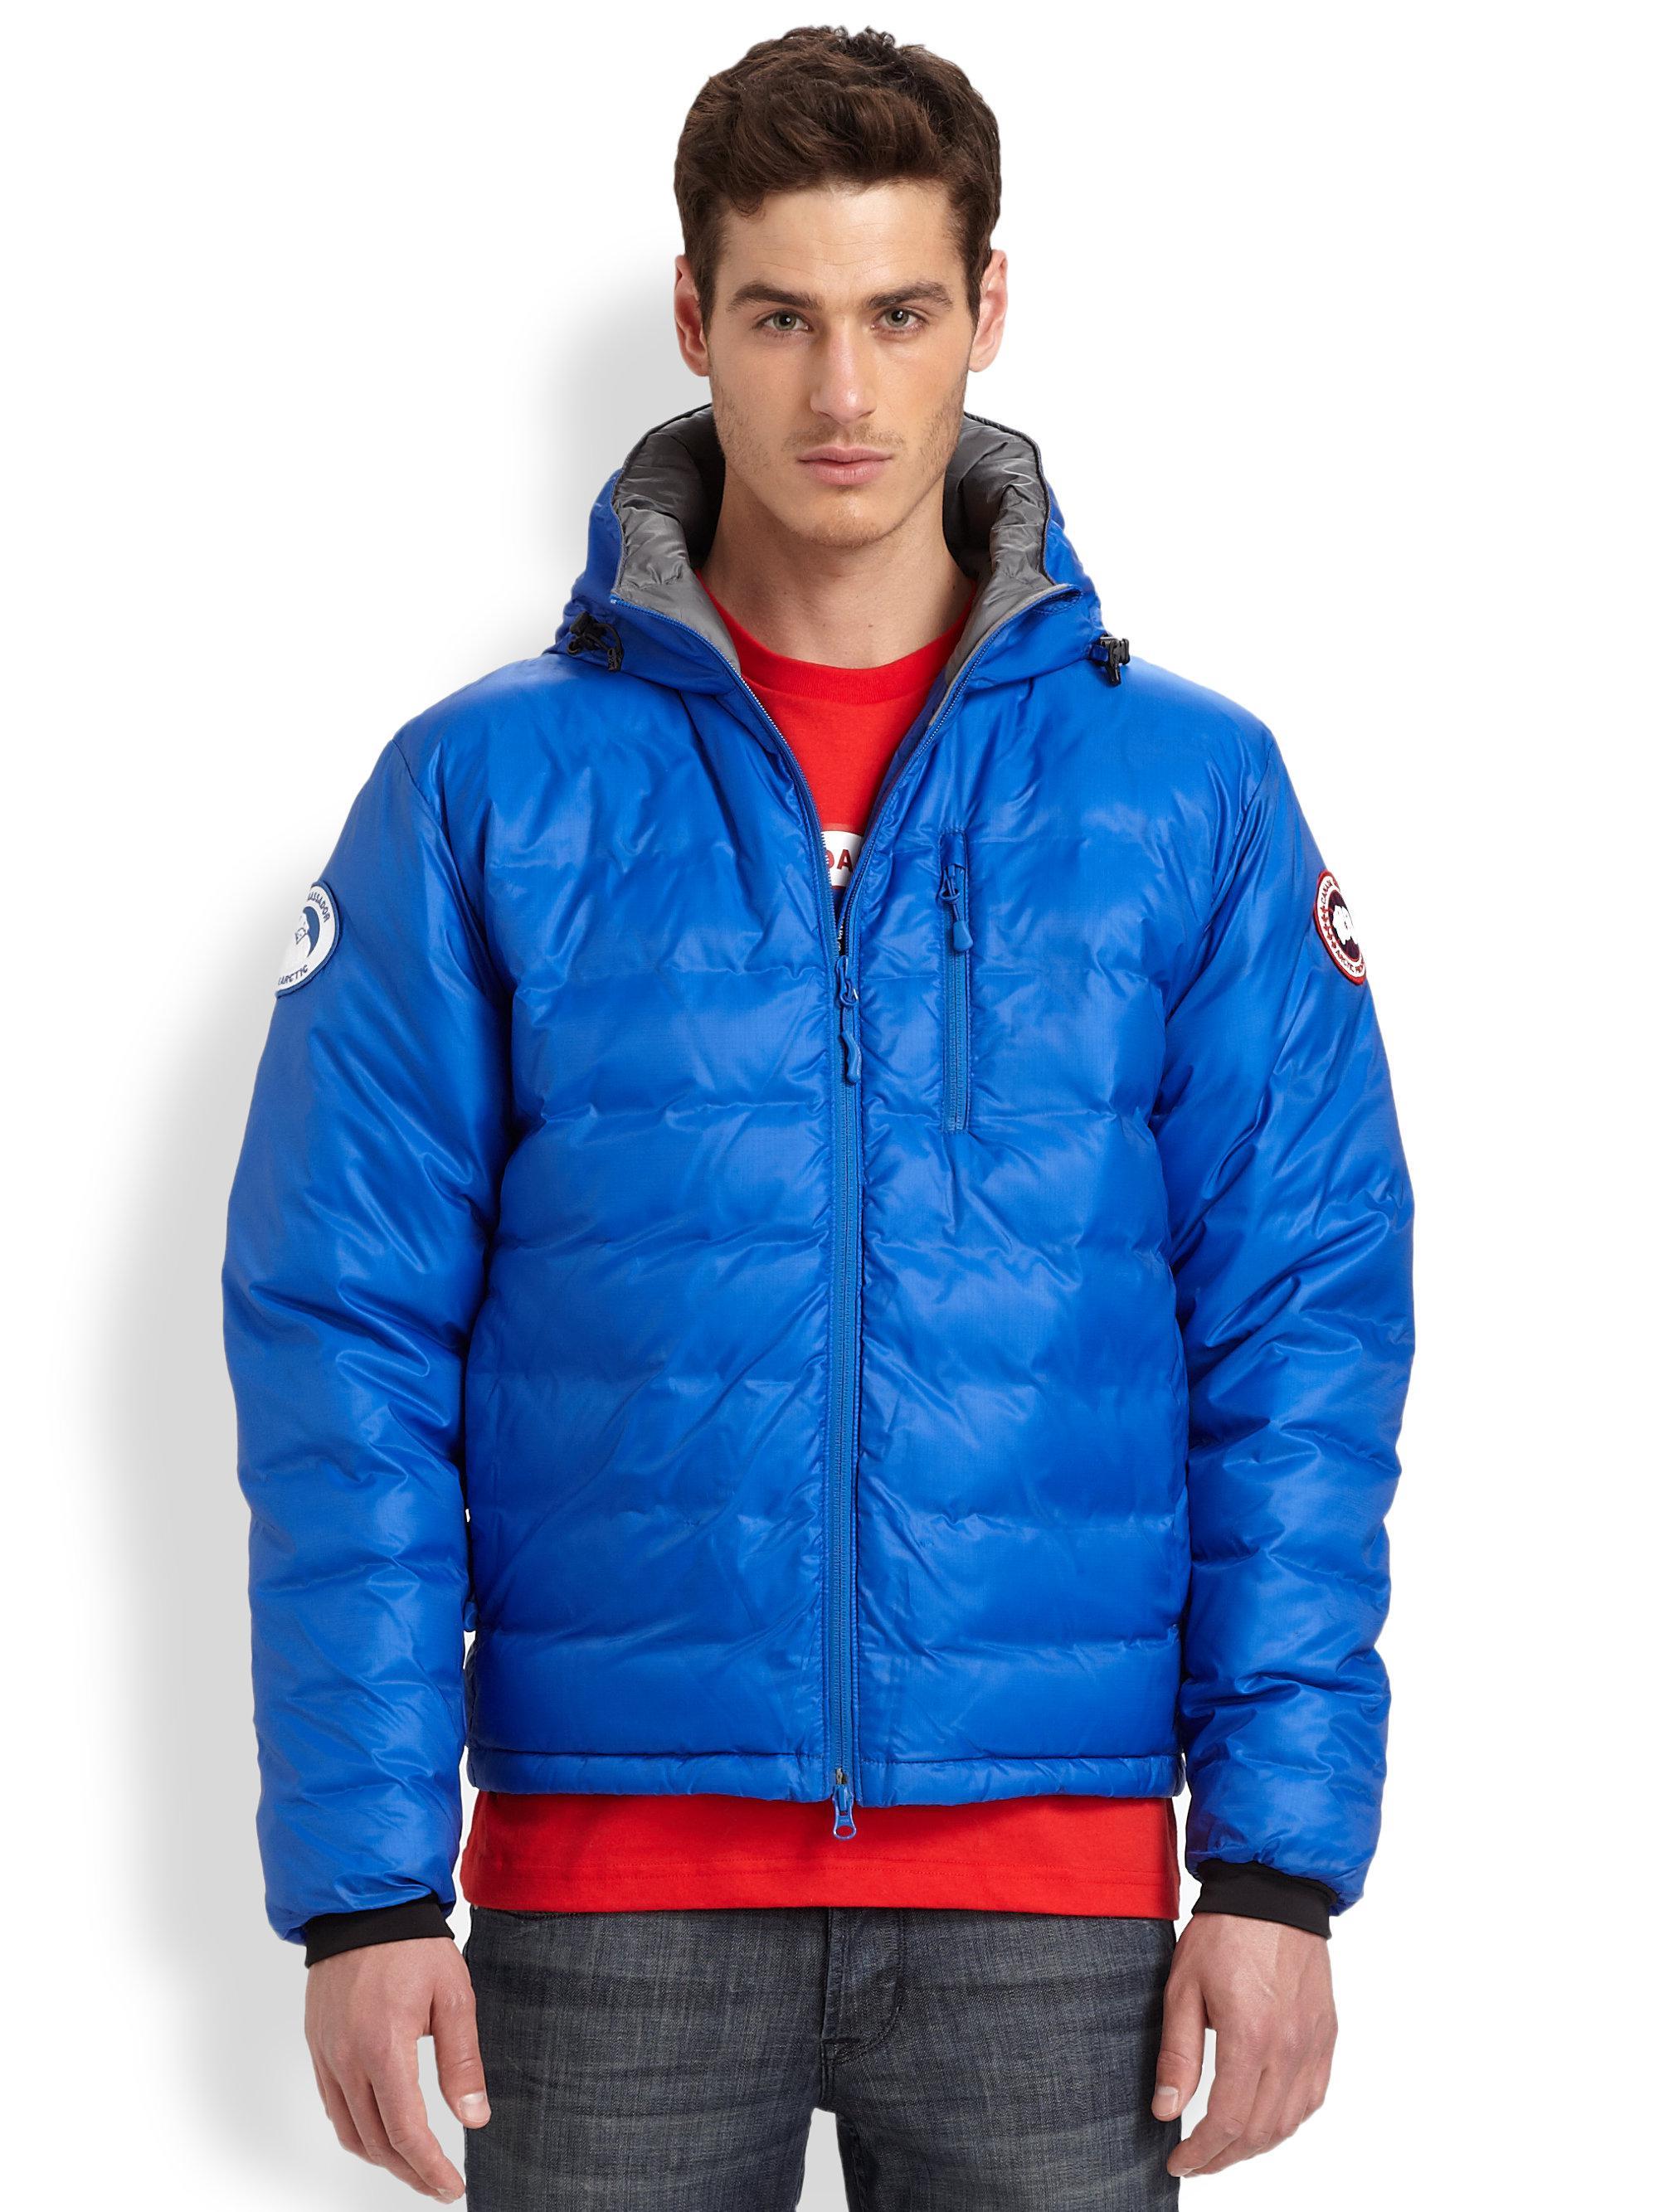 canada goose jacket nordstrom